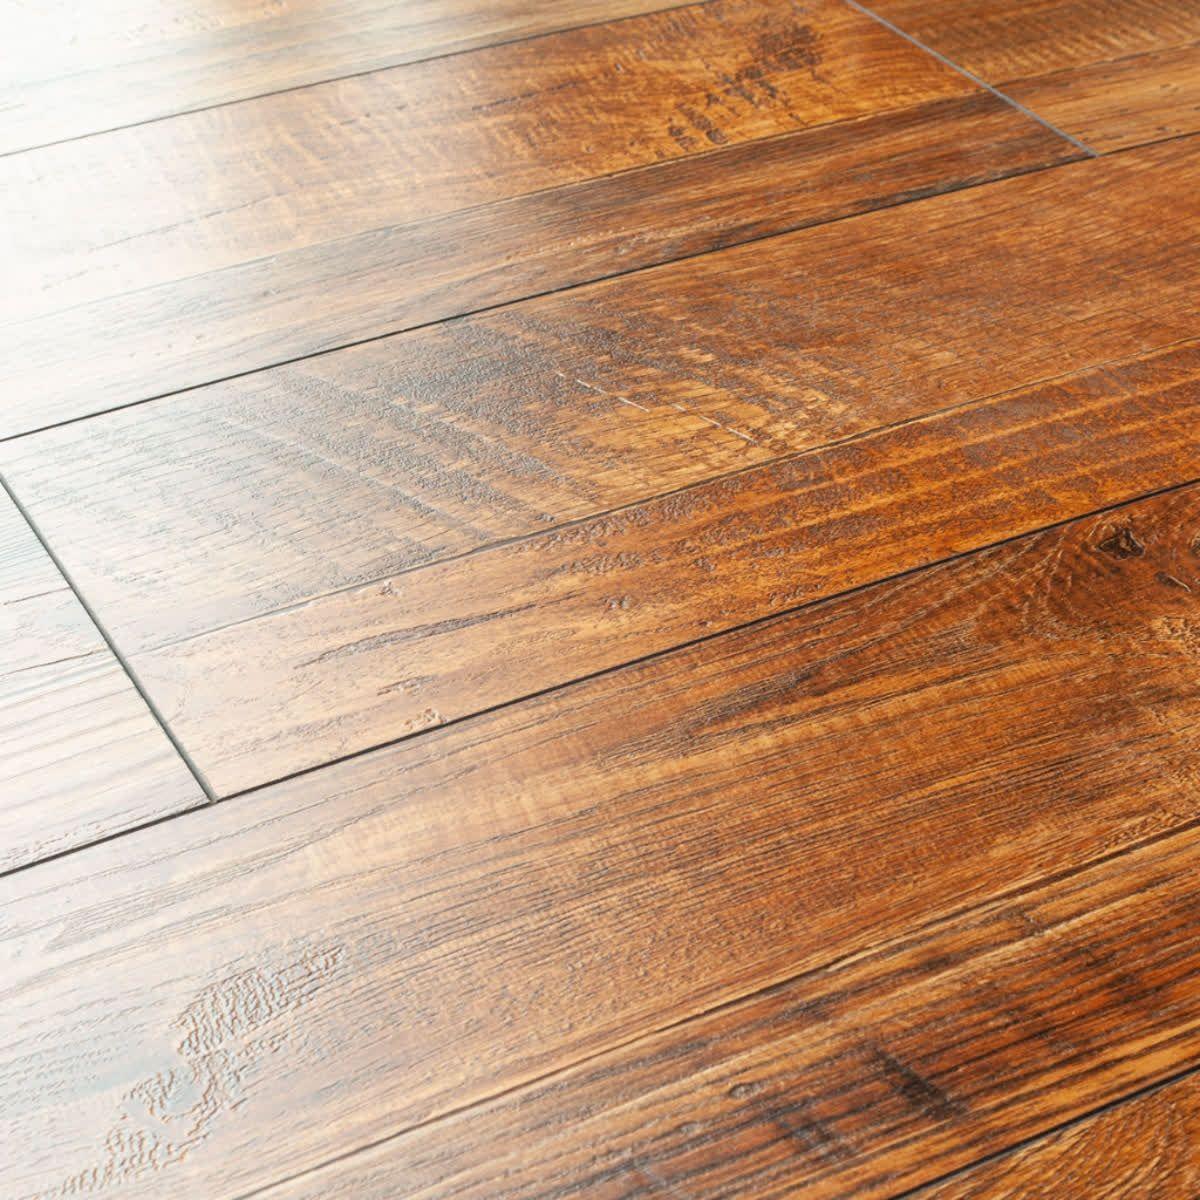 12mm Laminate Flooring Lesscare Dark Oak Textured Finish Laminate Flooring Flooring Laminate Flooring Colors